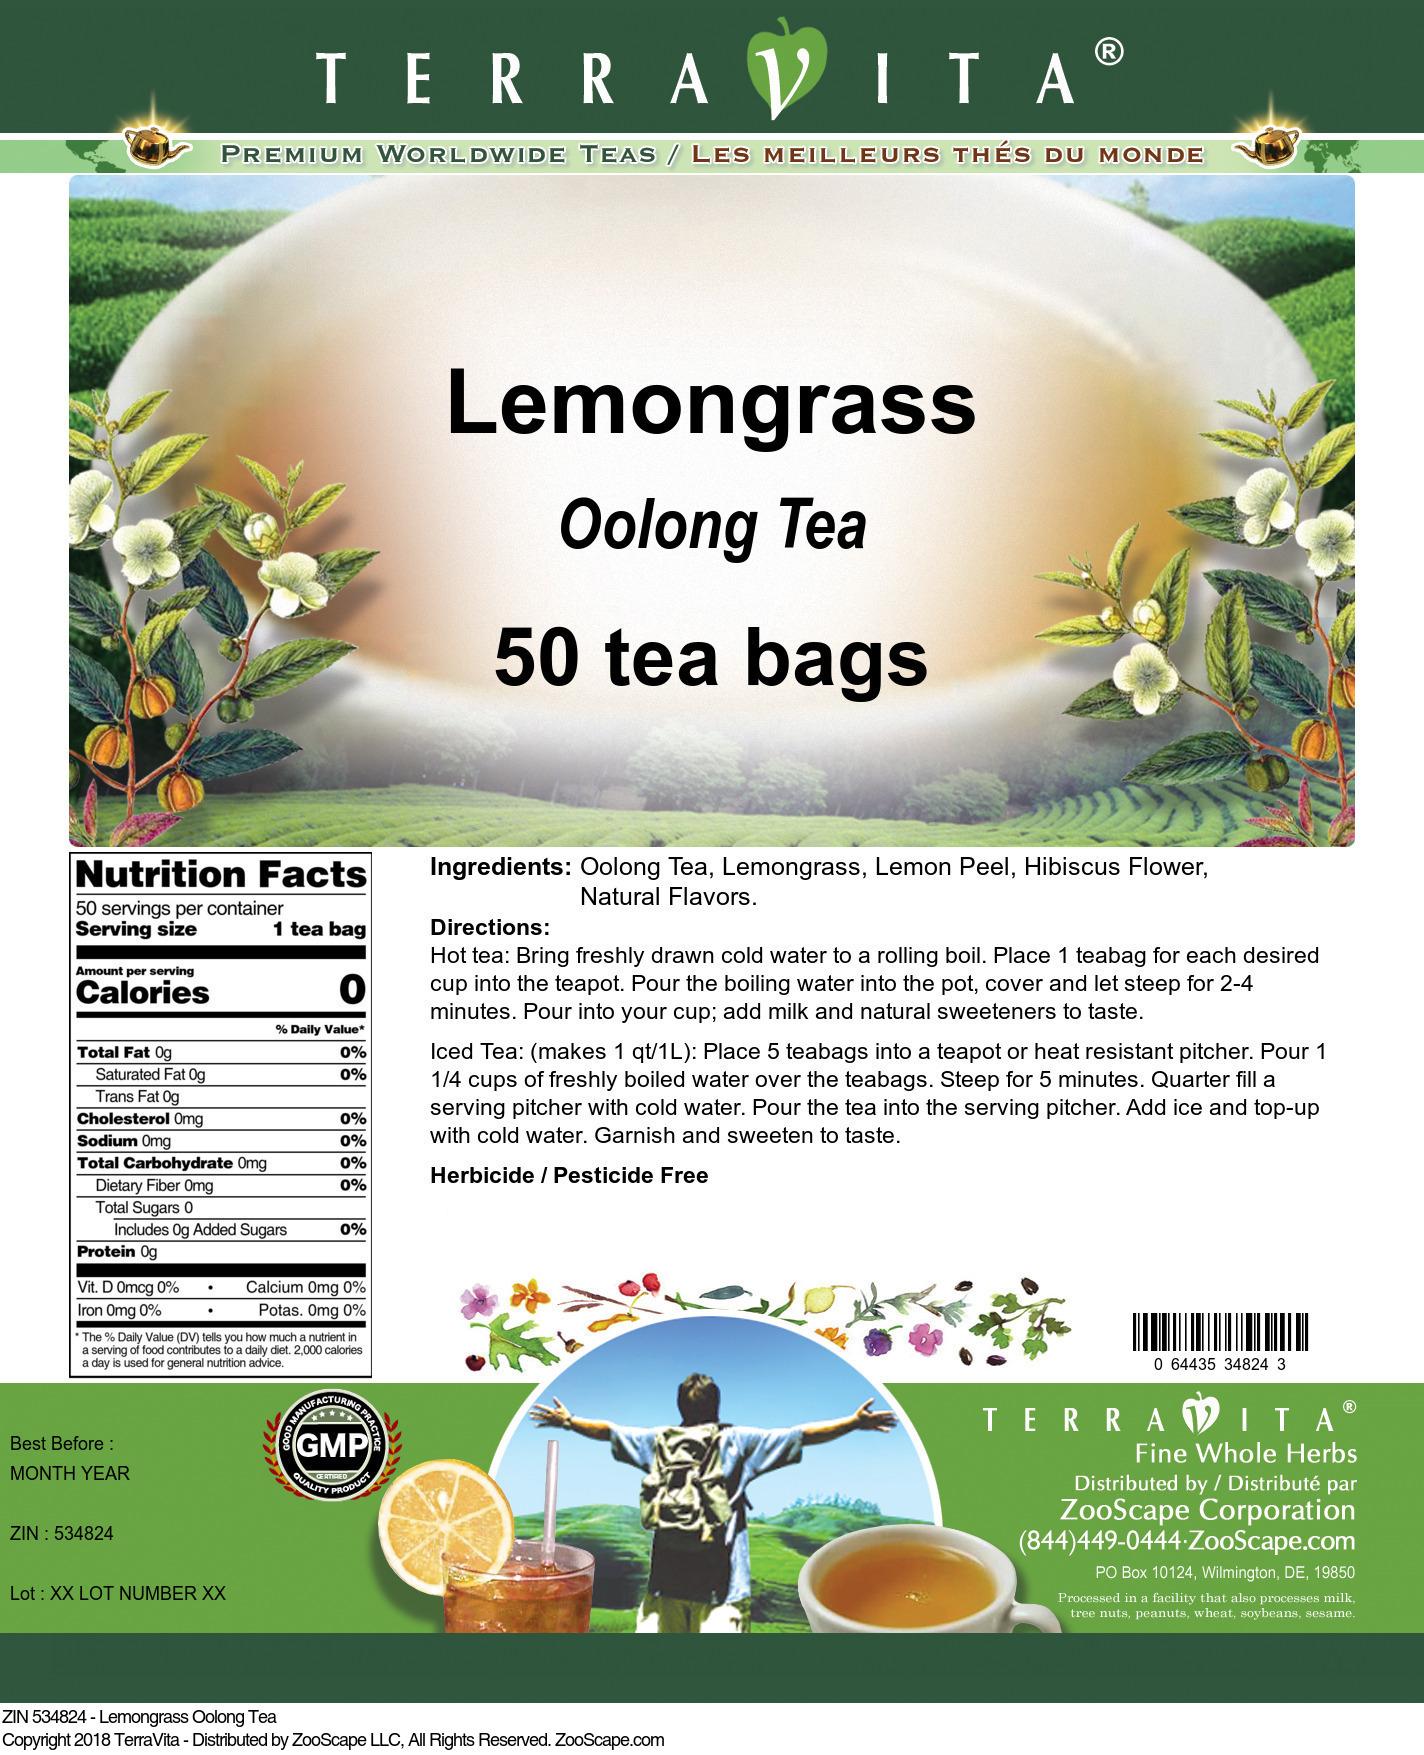 Lemongrass Oolong Tea